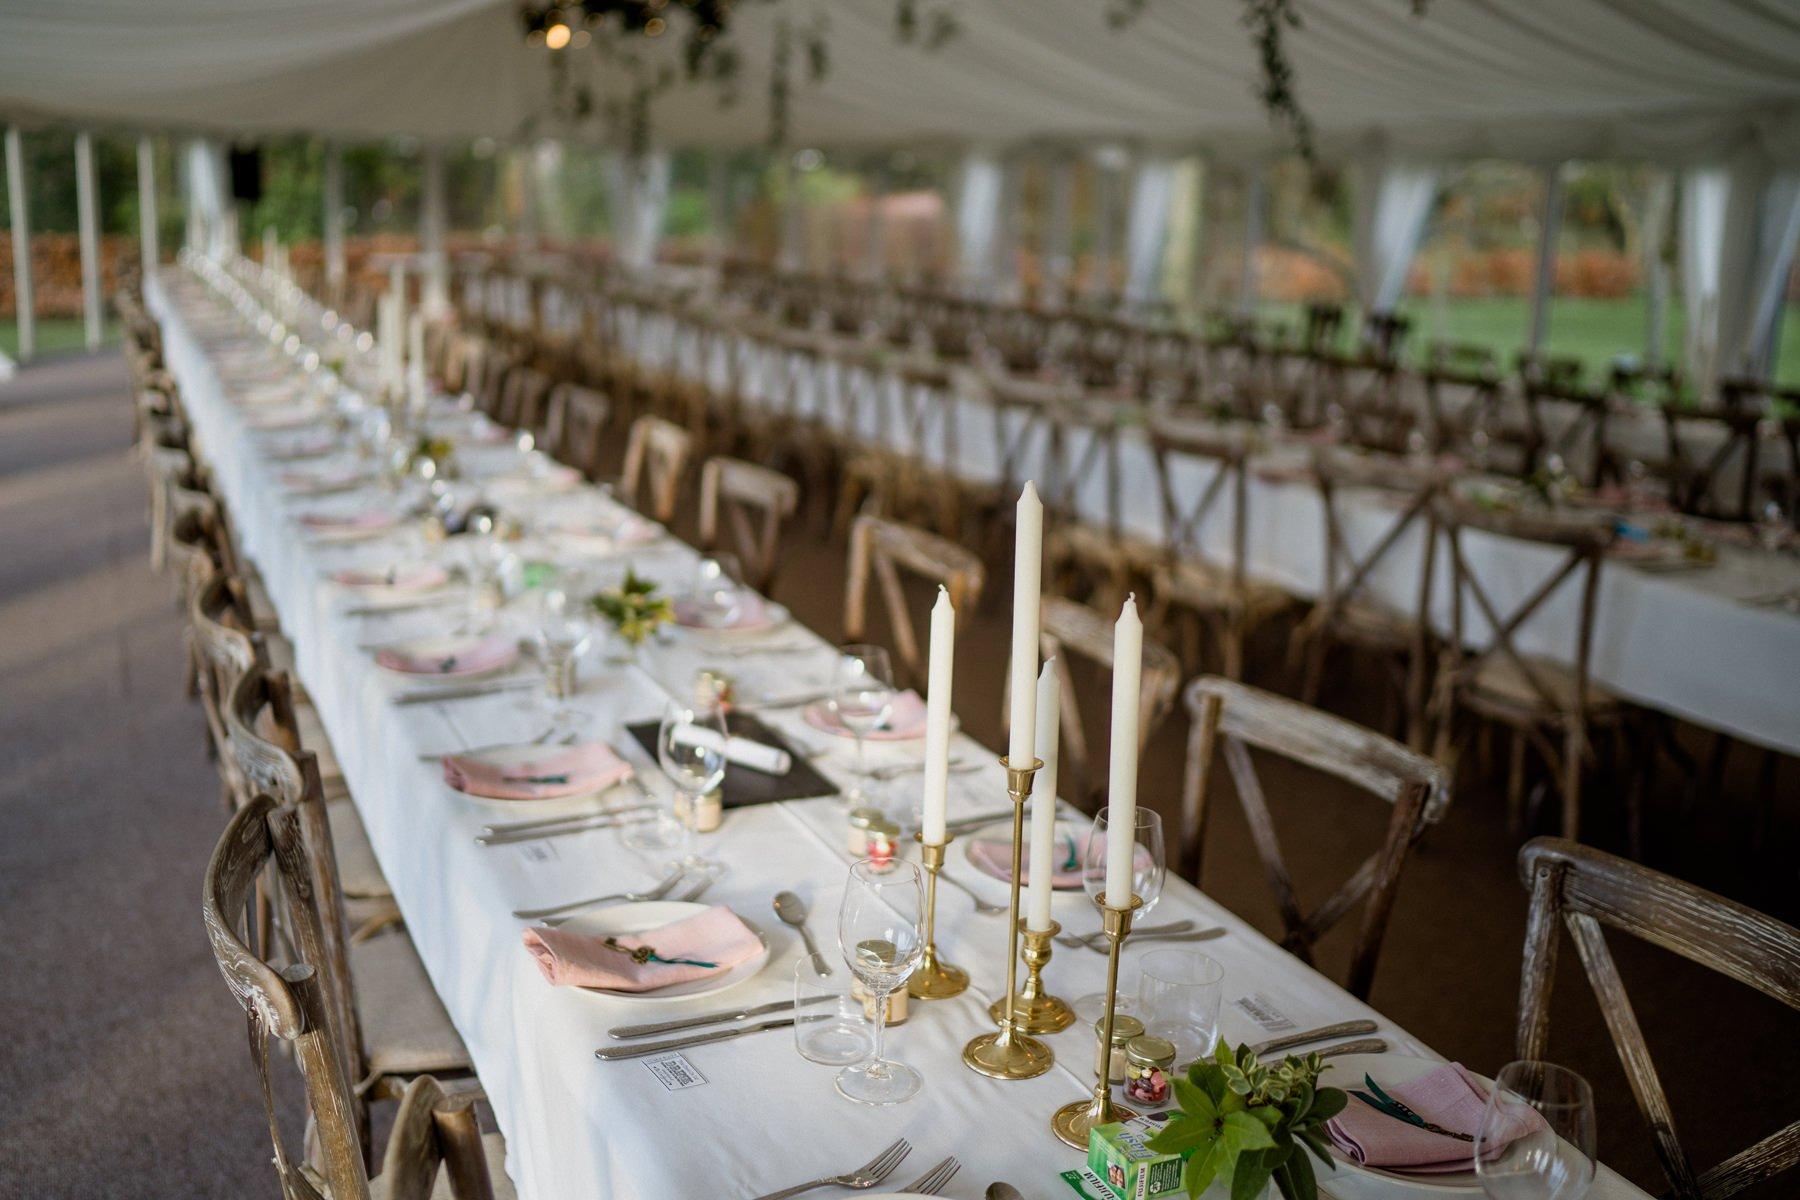 Cloughjordan House Winter Wedding decor